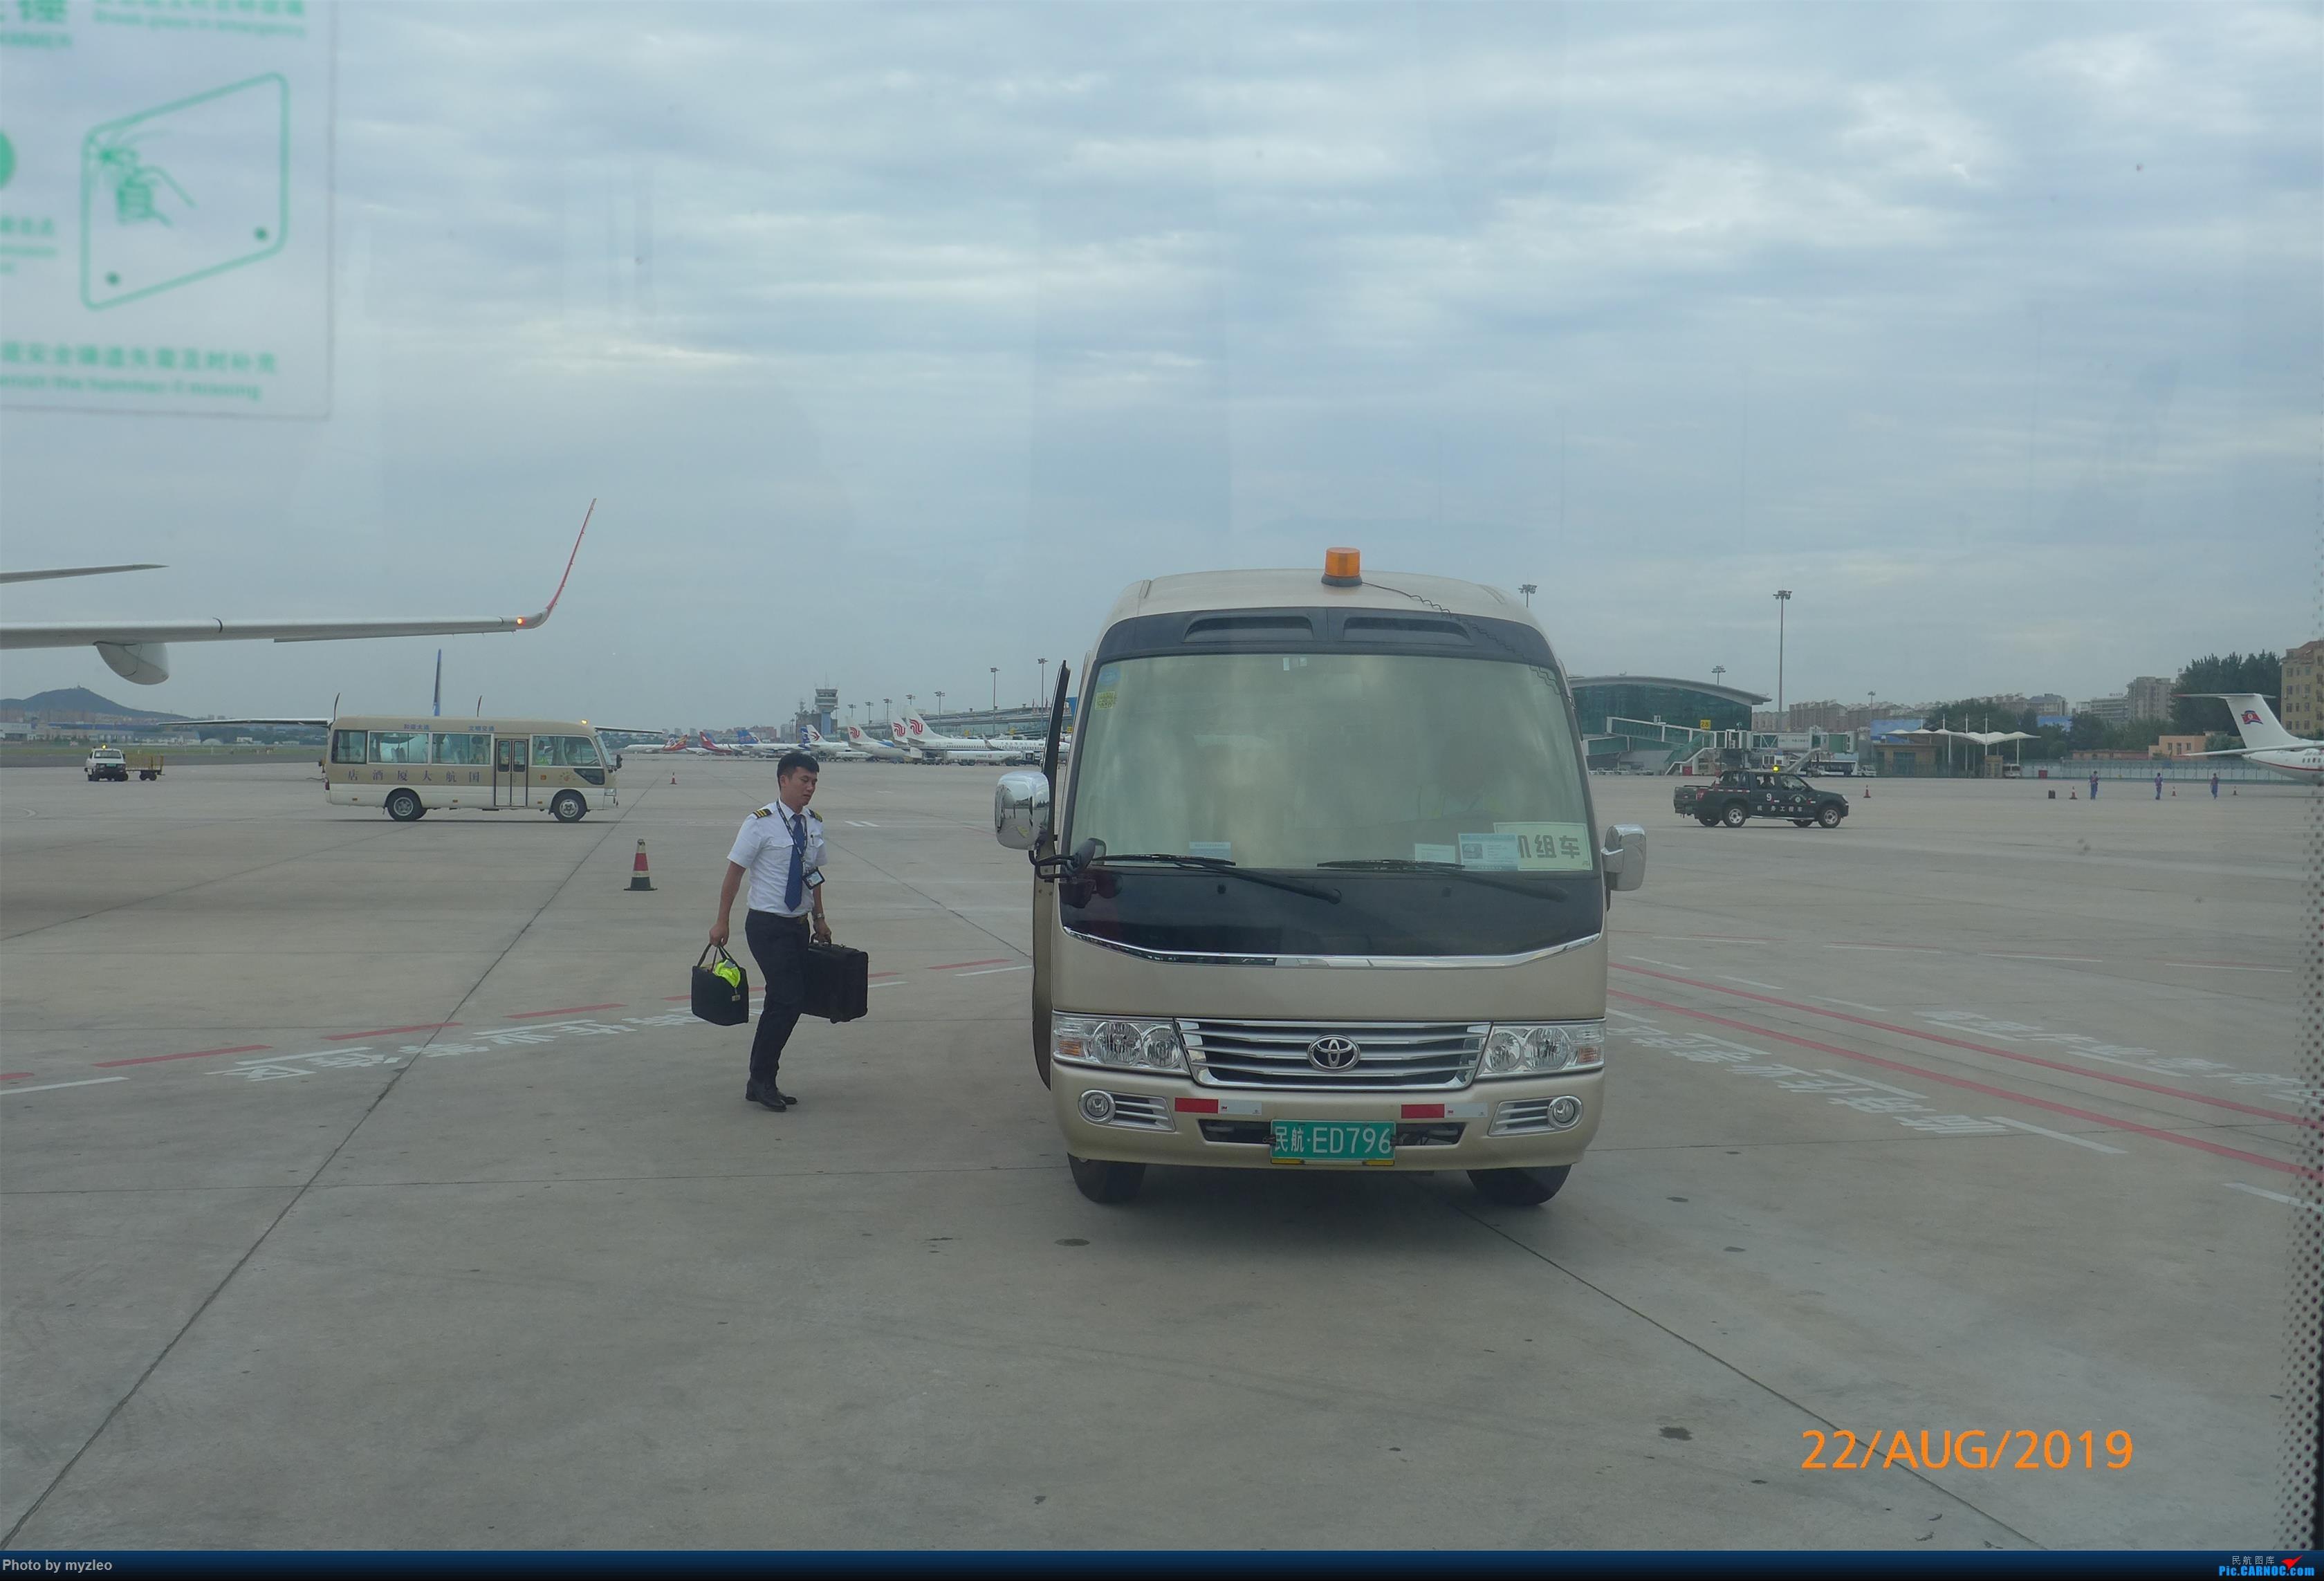 Re:[原创]【myzleo的游记5.2】梦圆一九(2)首访南苑把梦圆,初搭巴航连新缘 BOEING 757-200 B-2832 中国大连国际机场